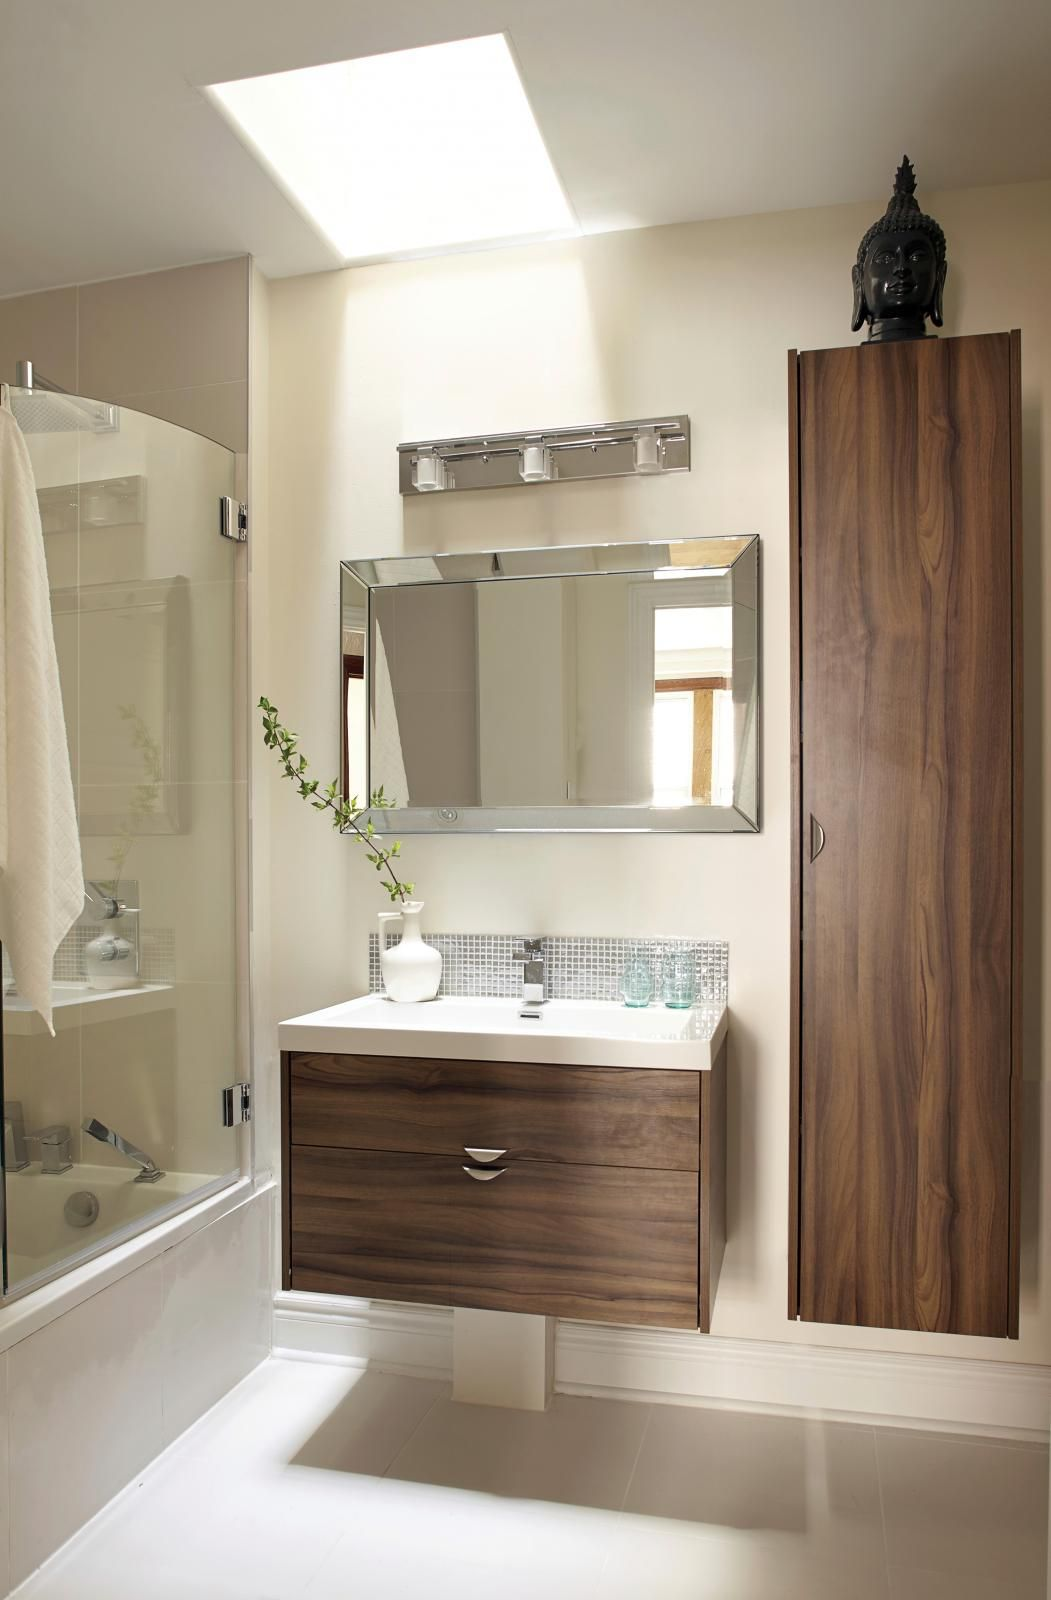 Condo: Effet de lumière  Salle de bain éclairage en 18  Salle